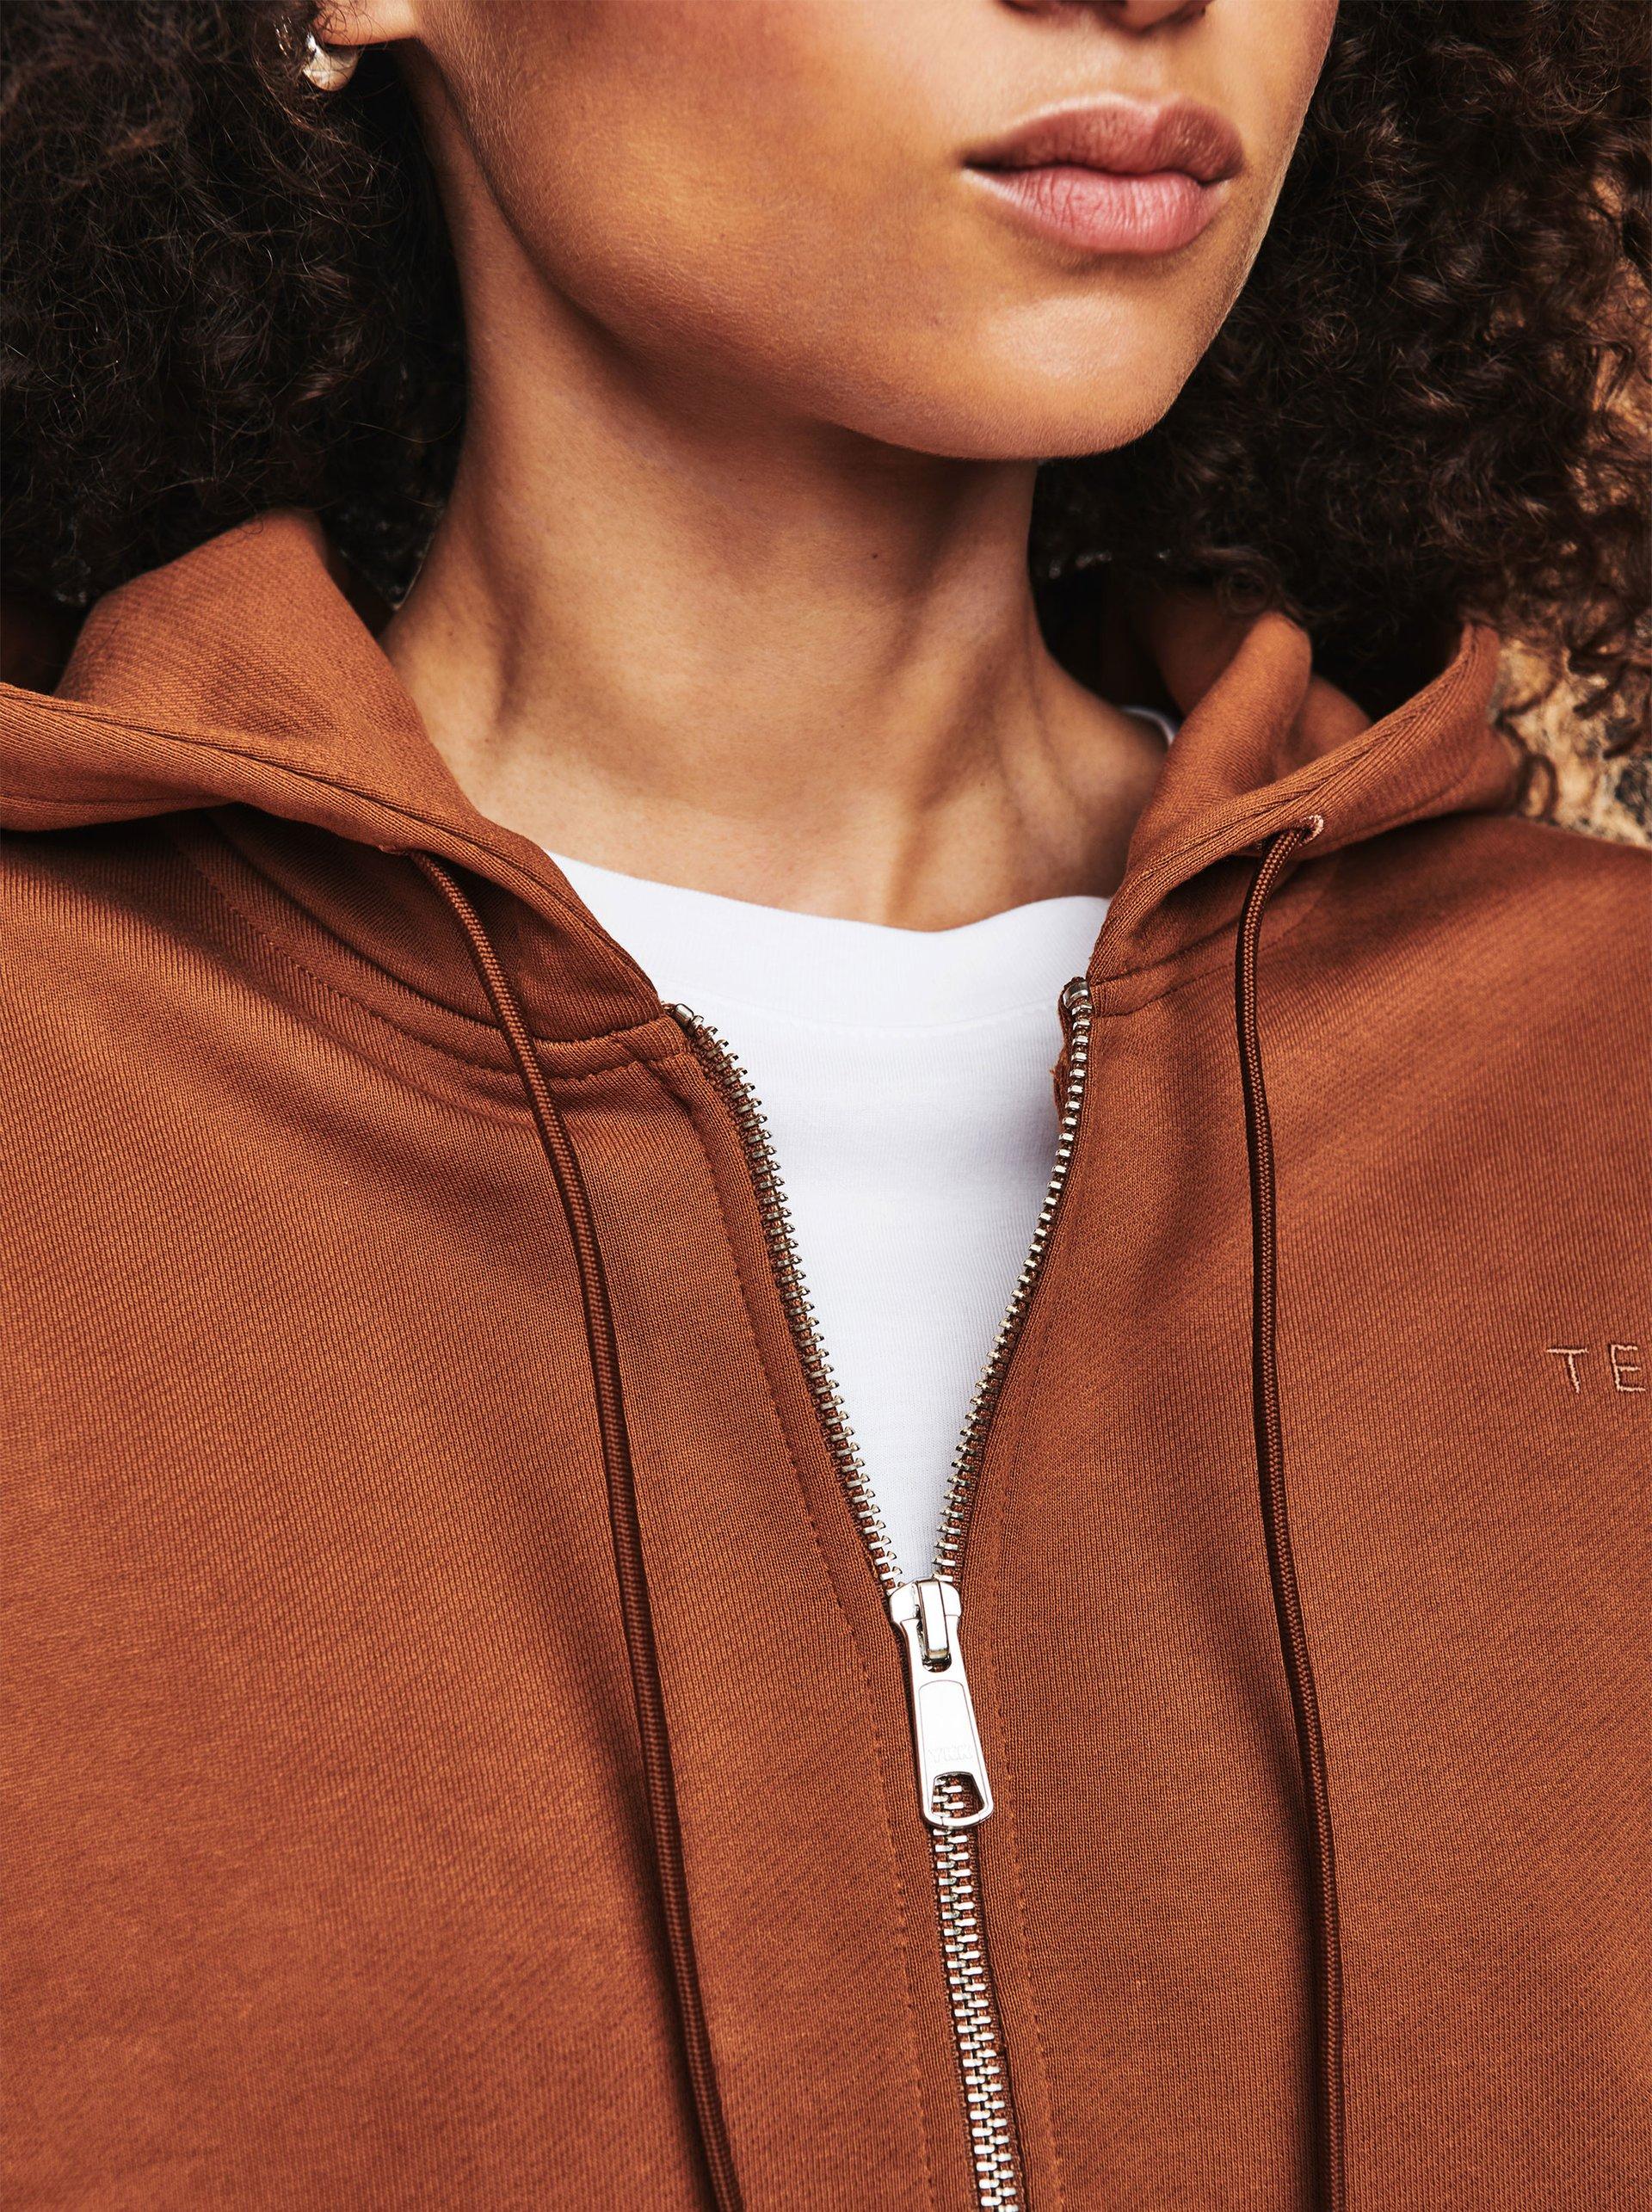 Teym-TheZipHoodie-Women-Camel02